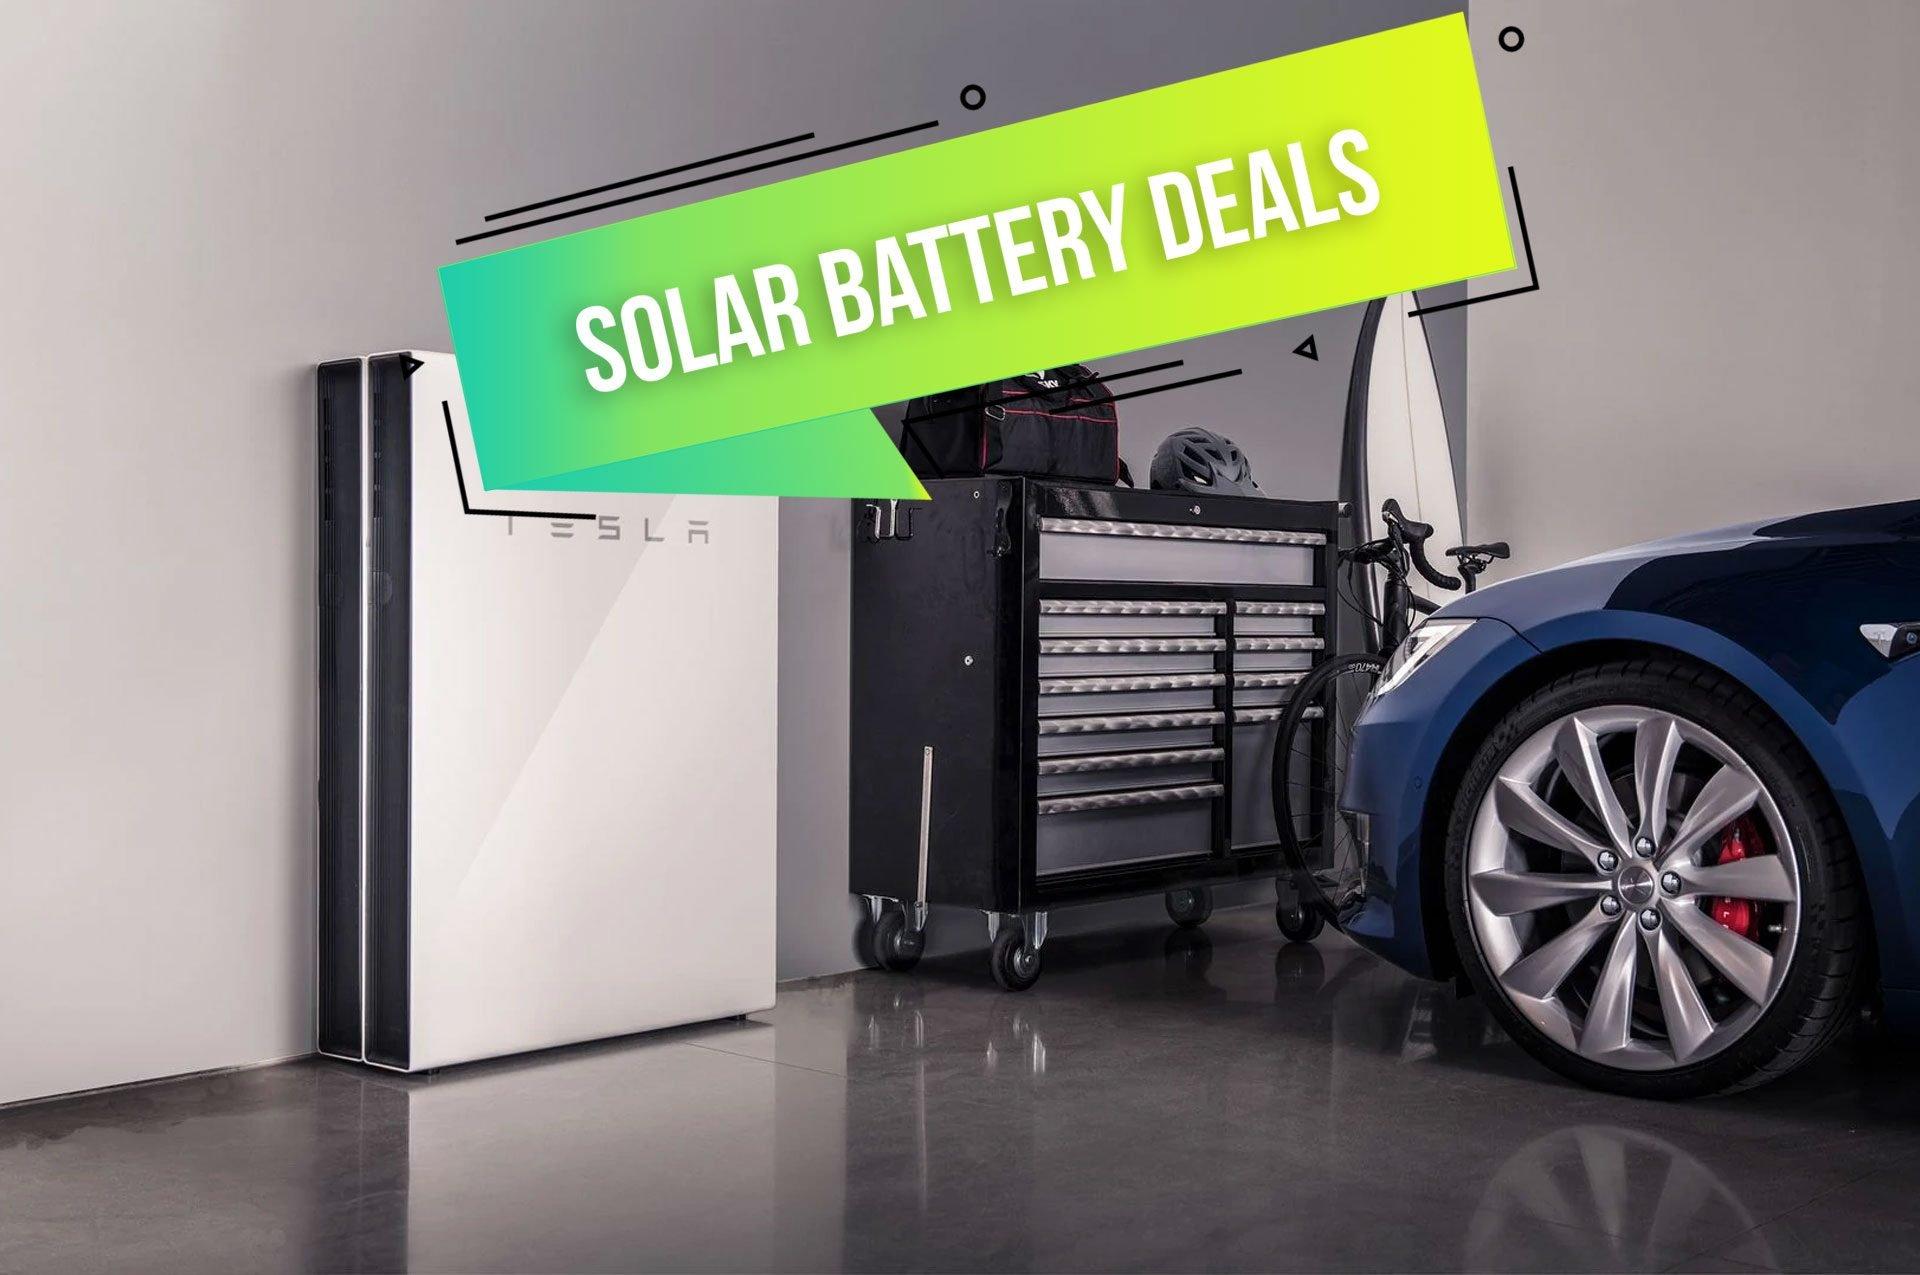 Solar Battery Deals